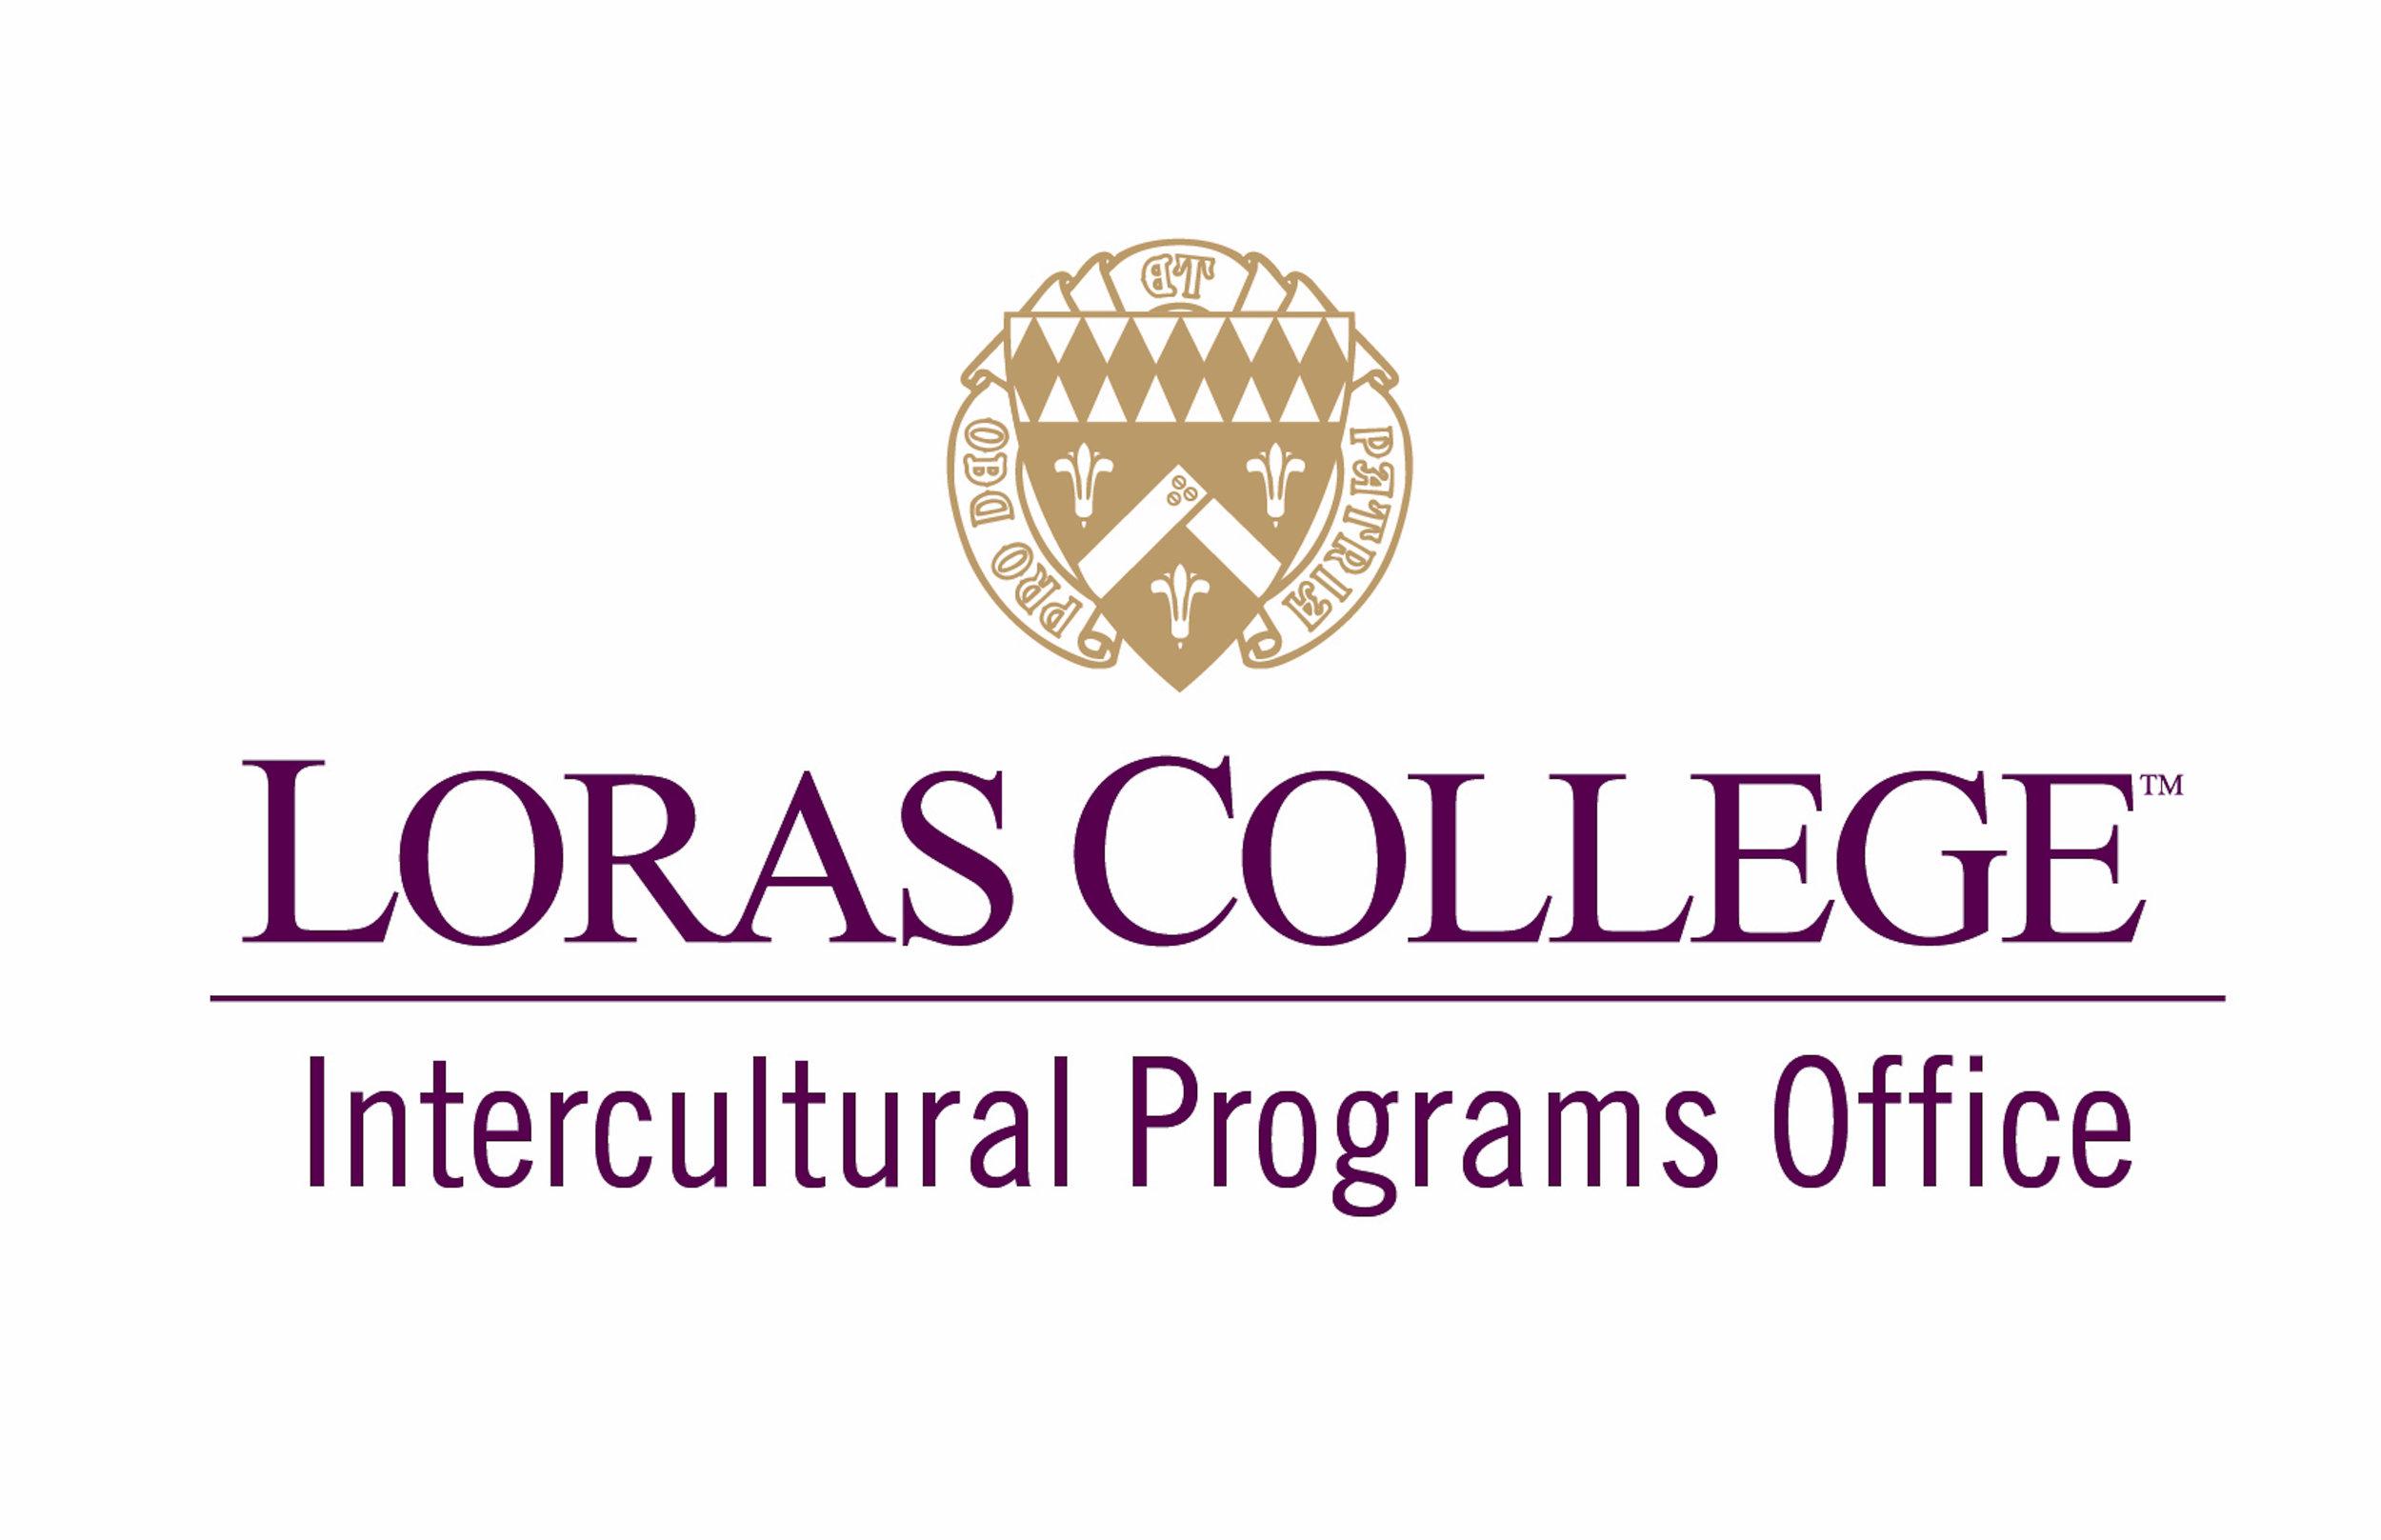 Loras College Intercultural Programs Office.jpg